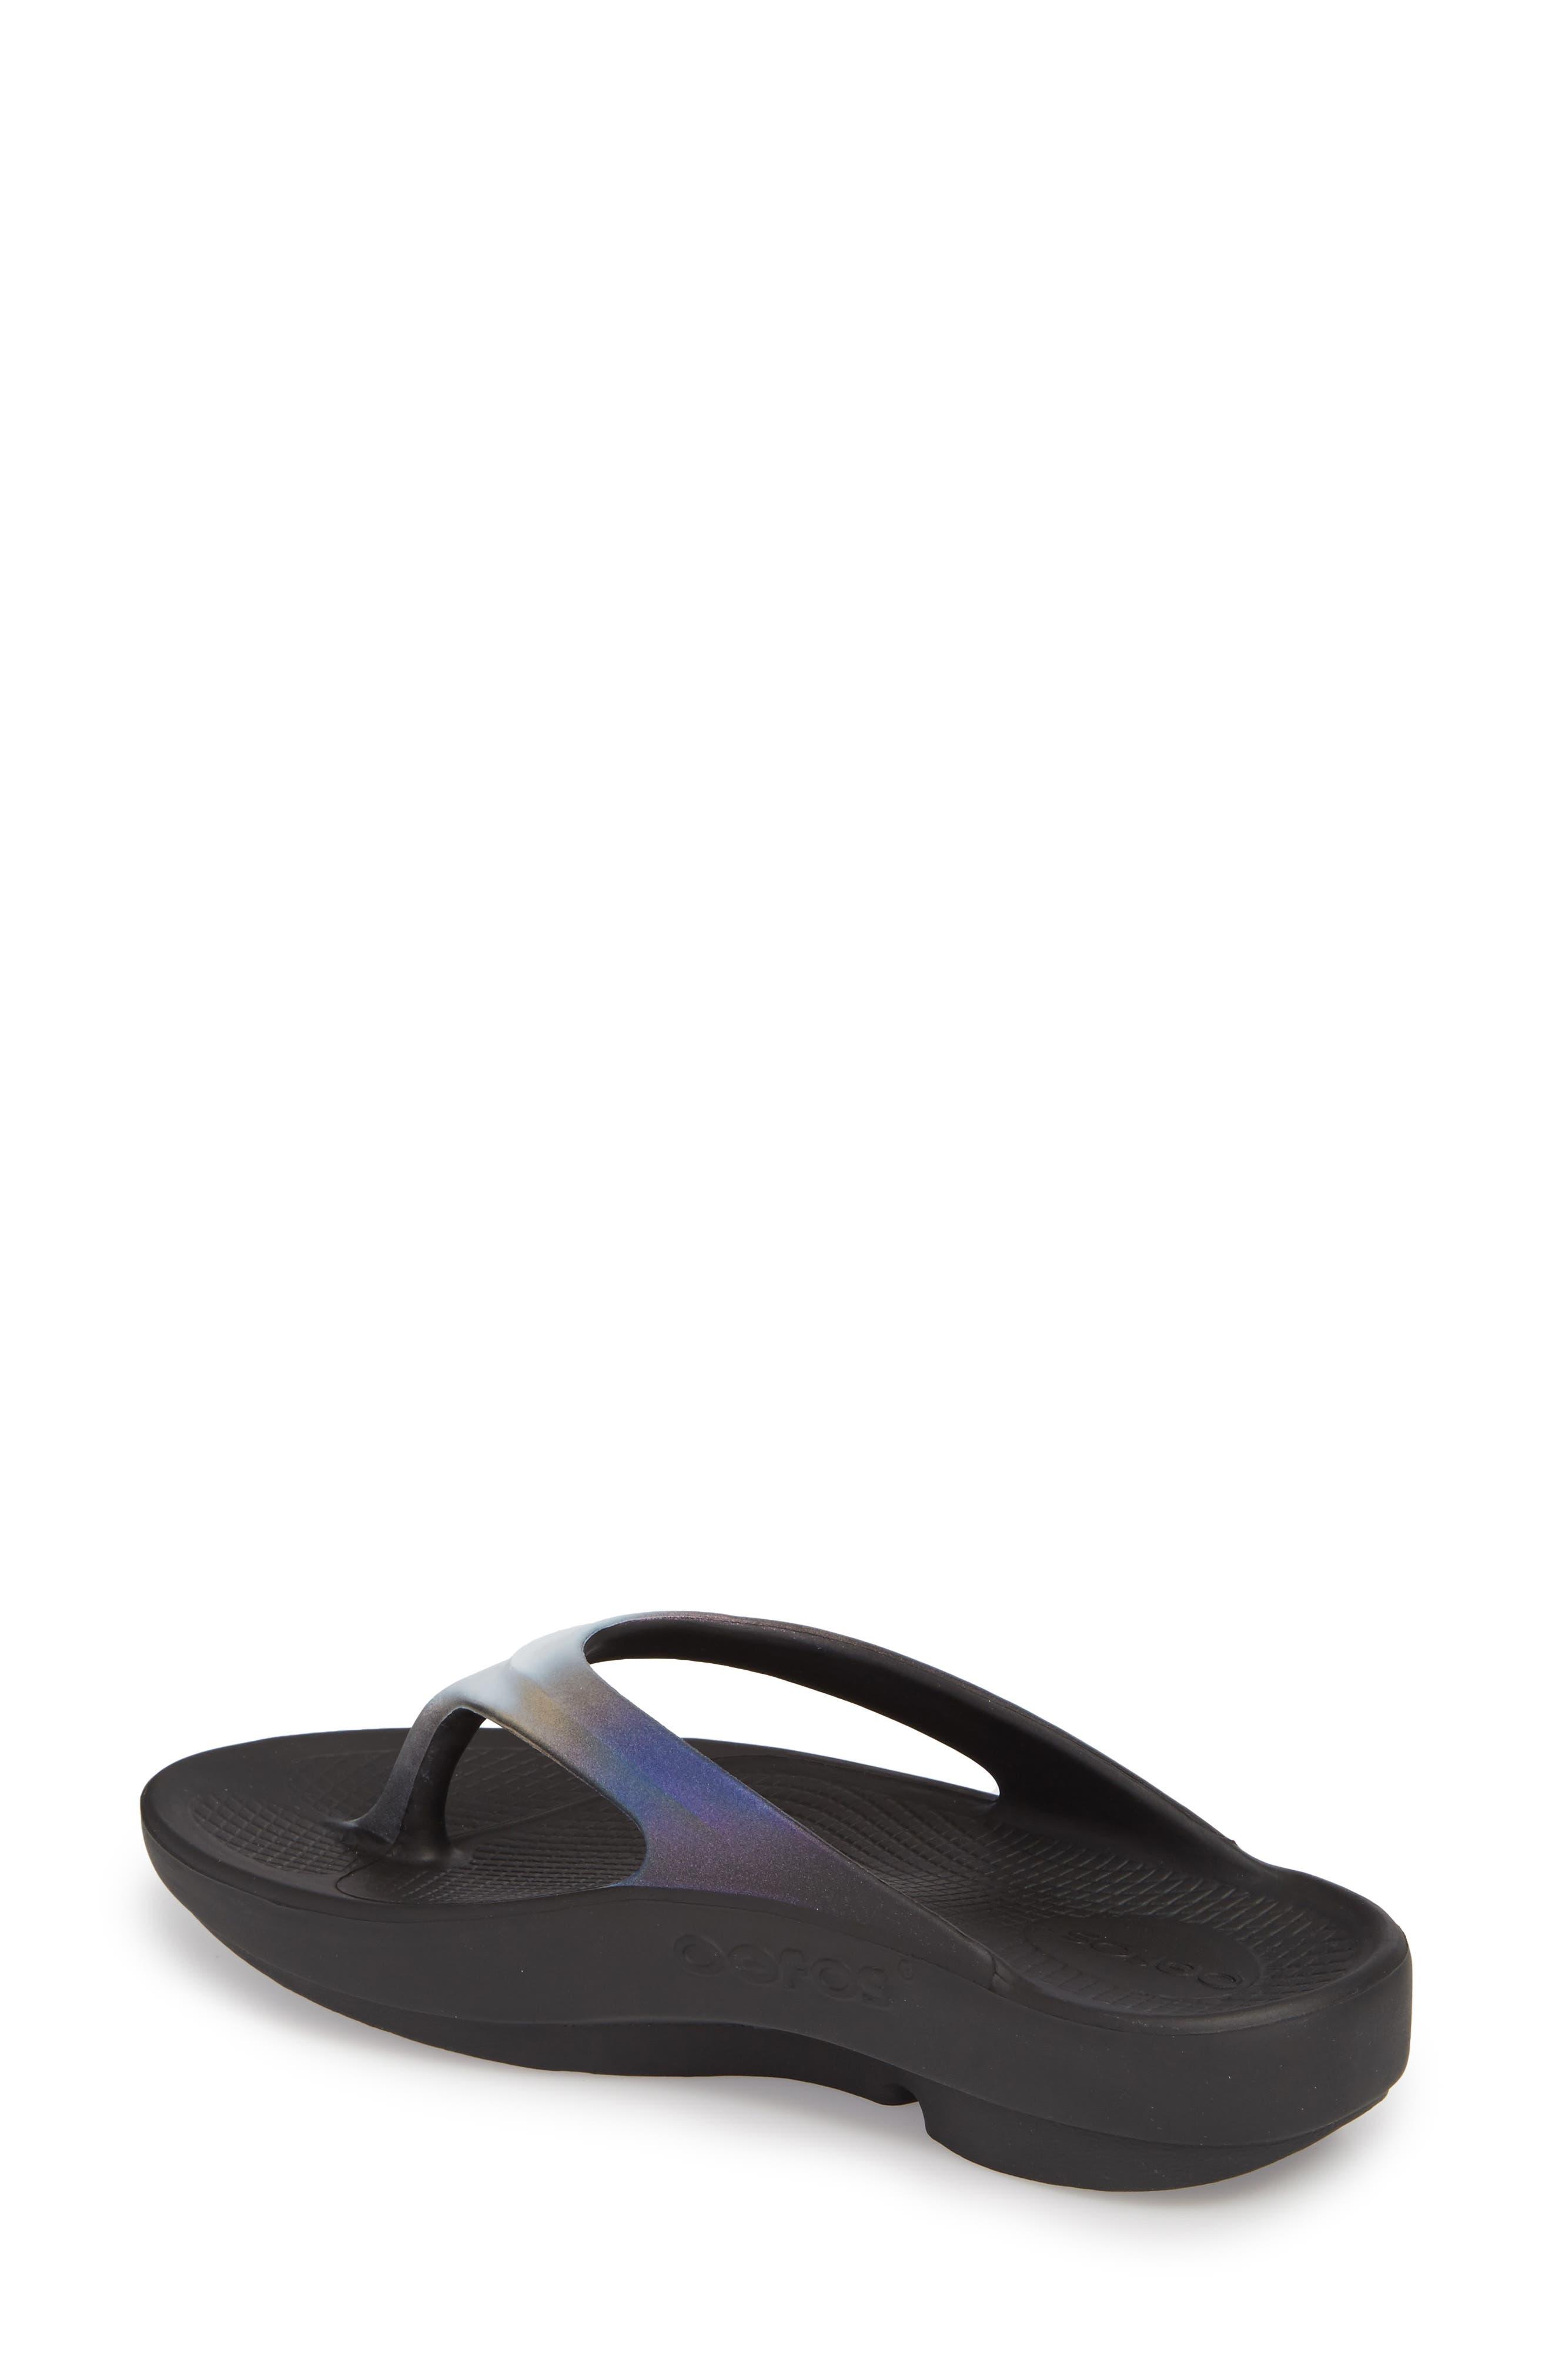 OOlala Luxe Sandal,                             Alternate thumbnail 4, color,